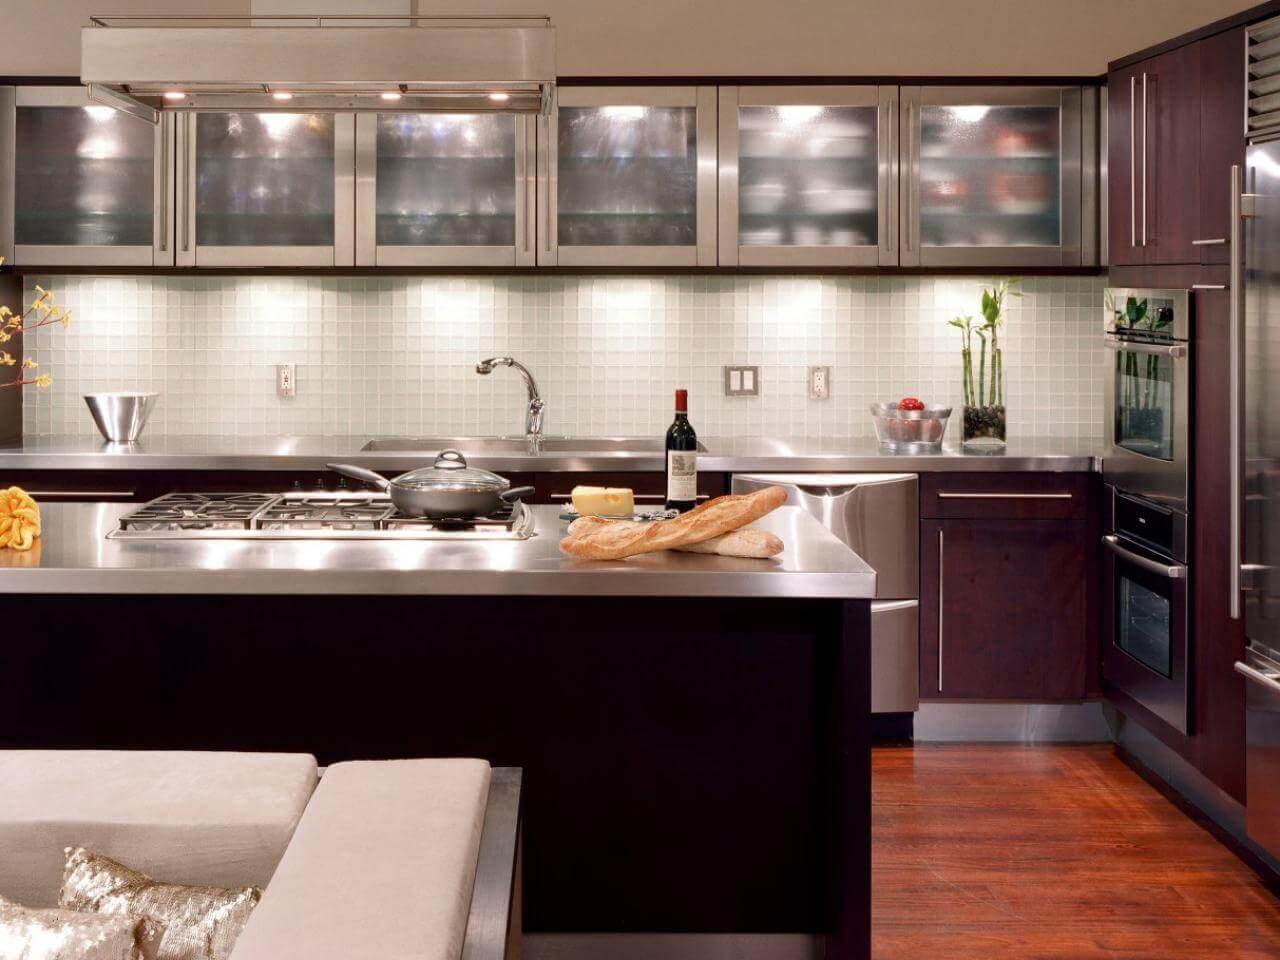 78 Great Looking Modern Kitchen Gallery Sinks Islands